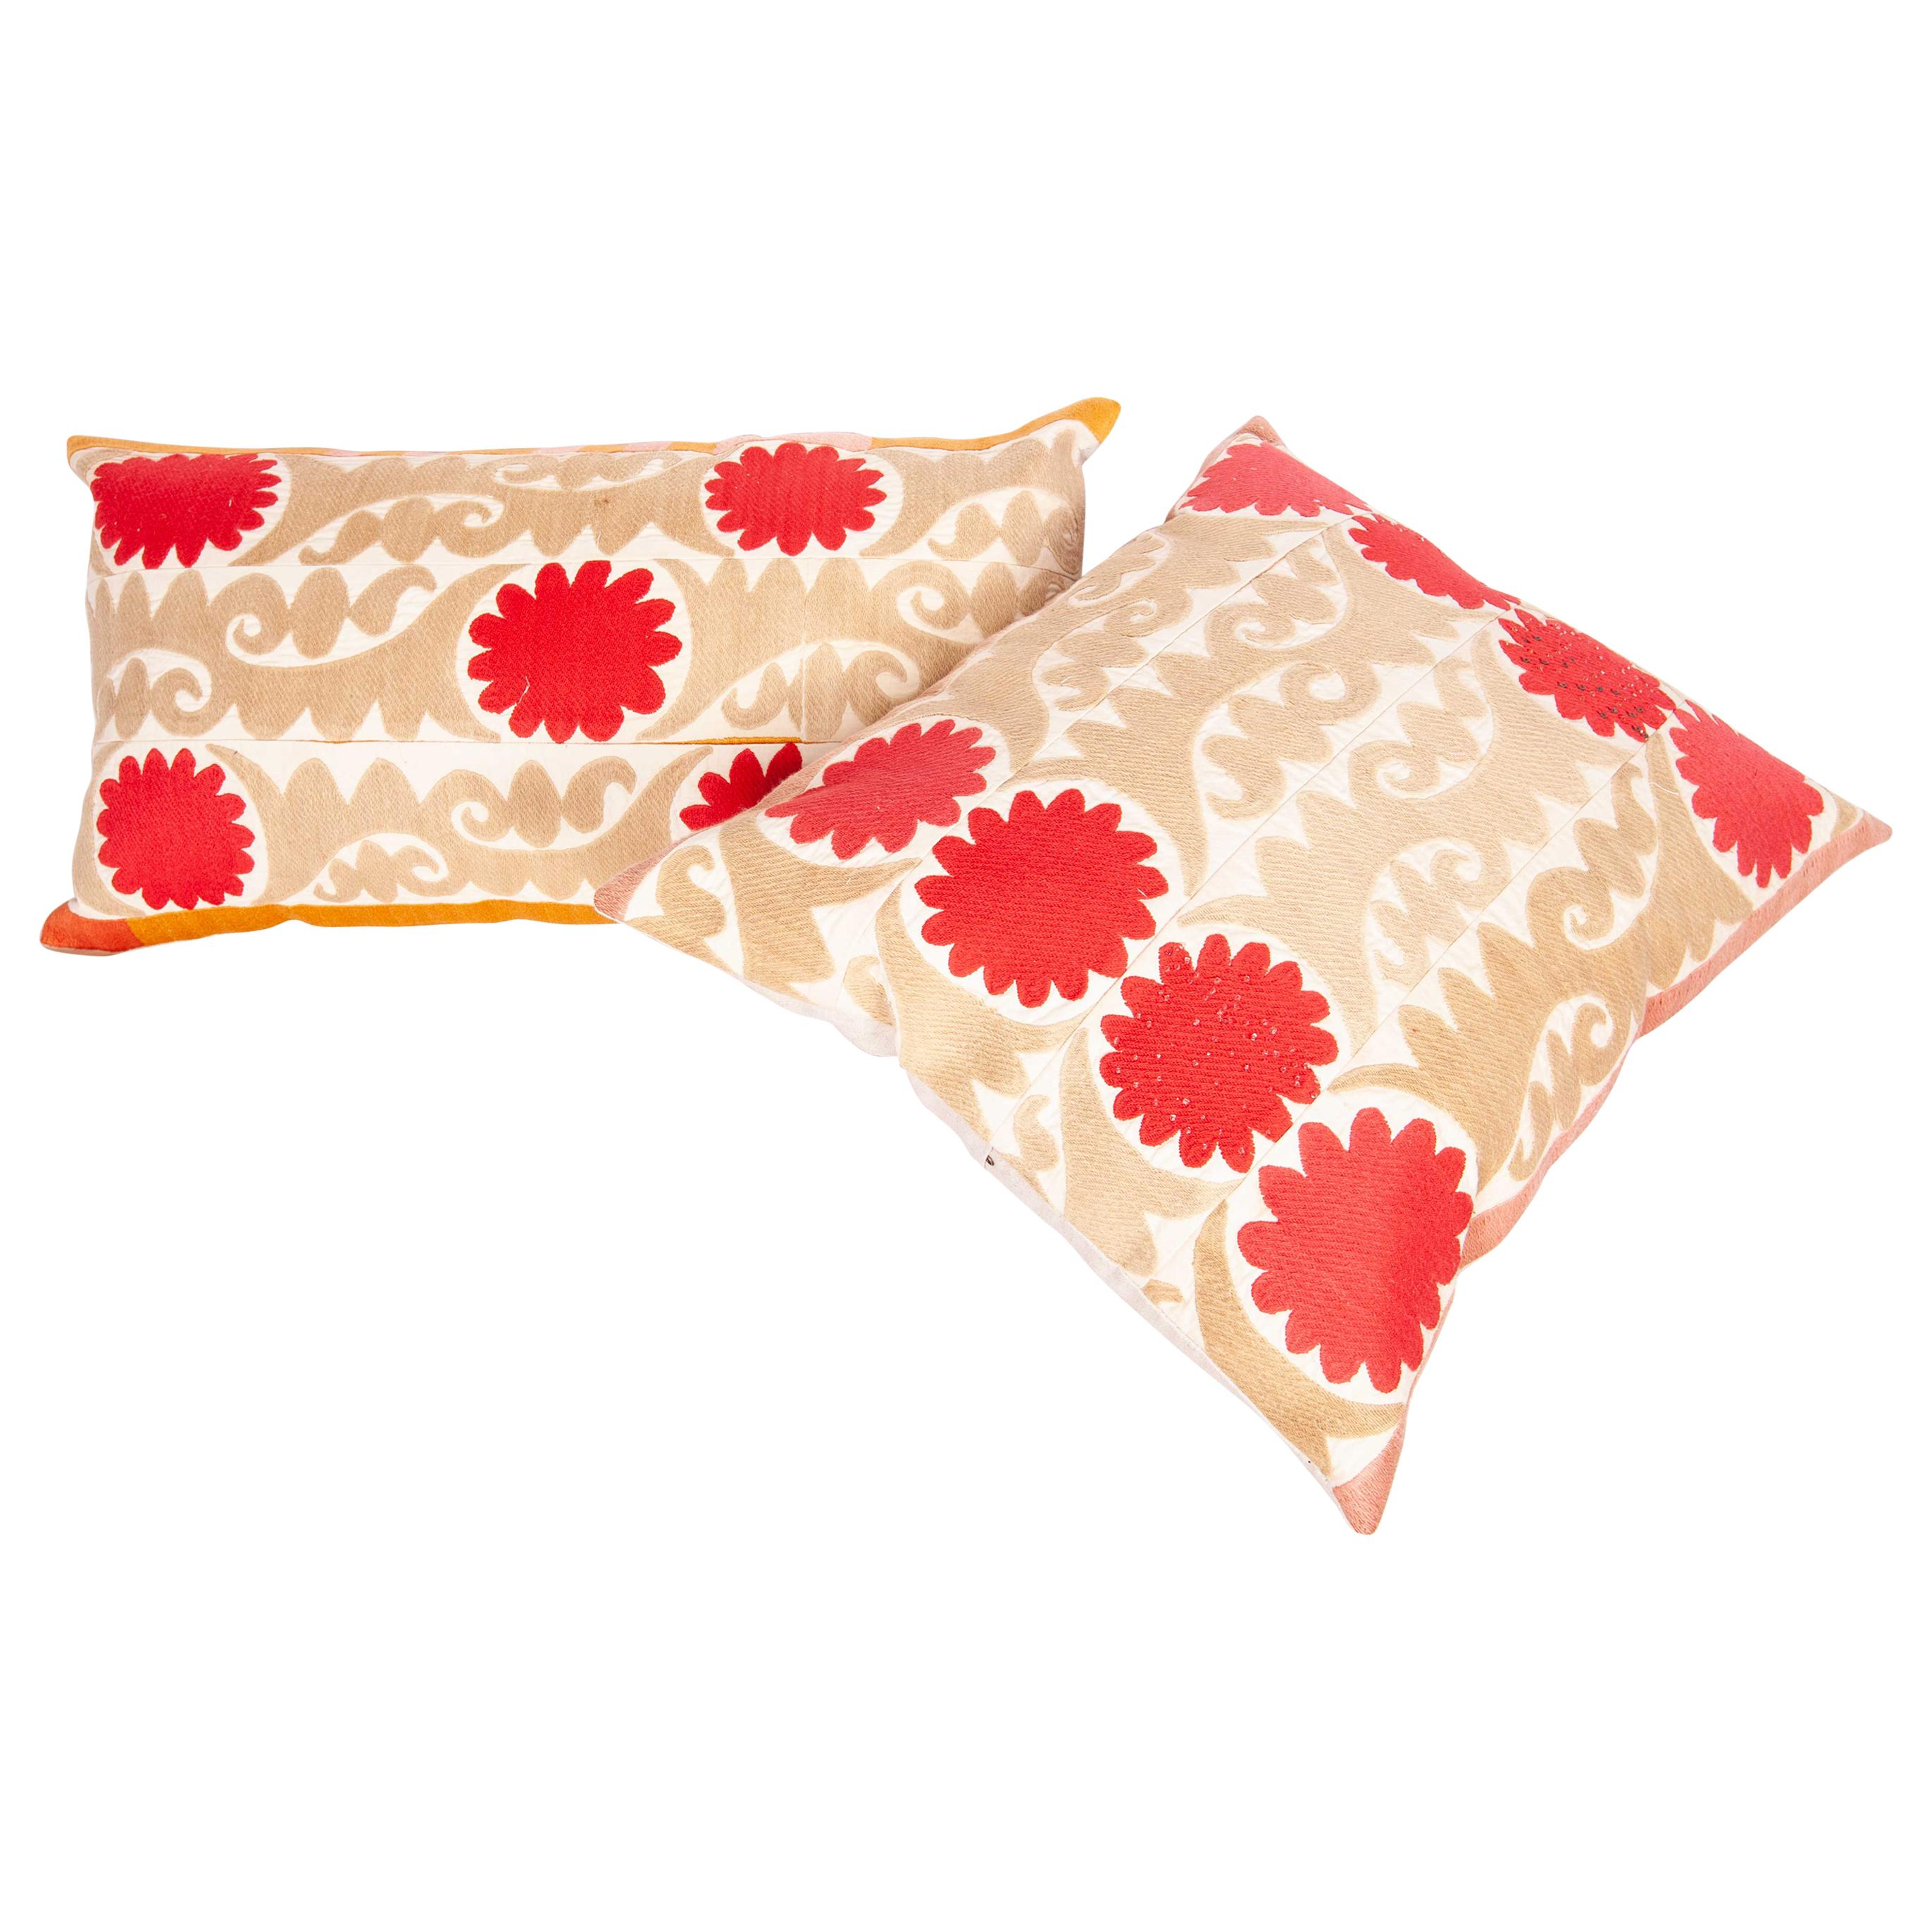 Suzani Pillow Cases Fashioned from a Vintage Uzbek Suzani